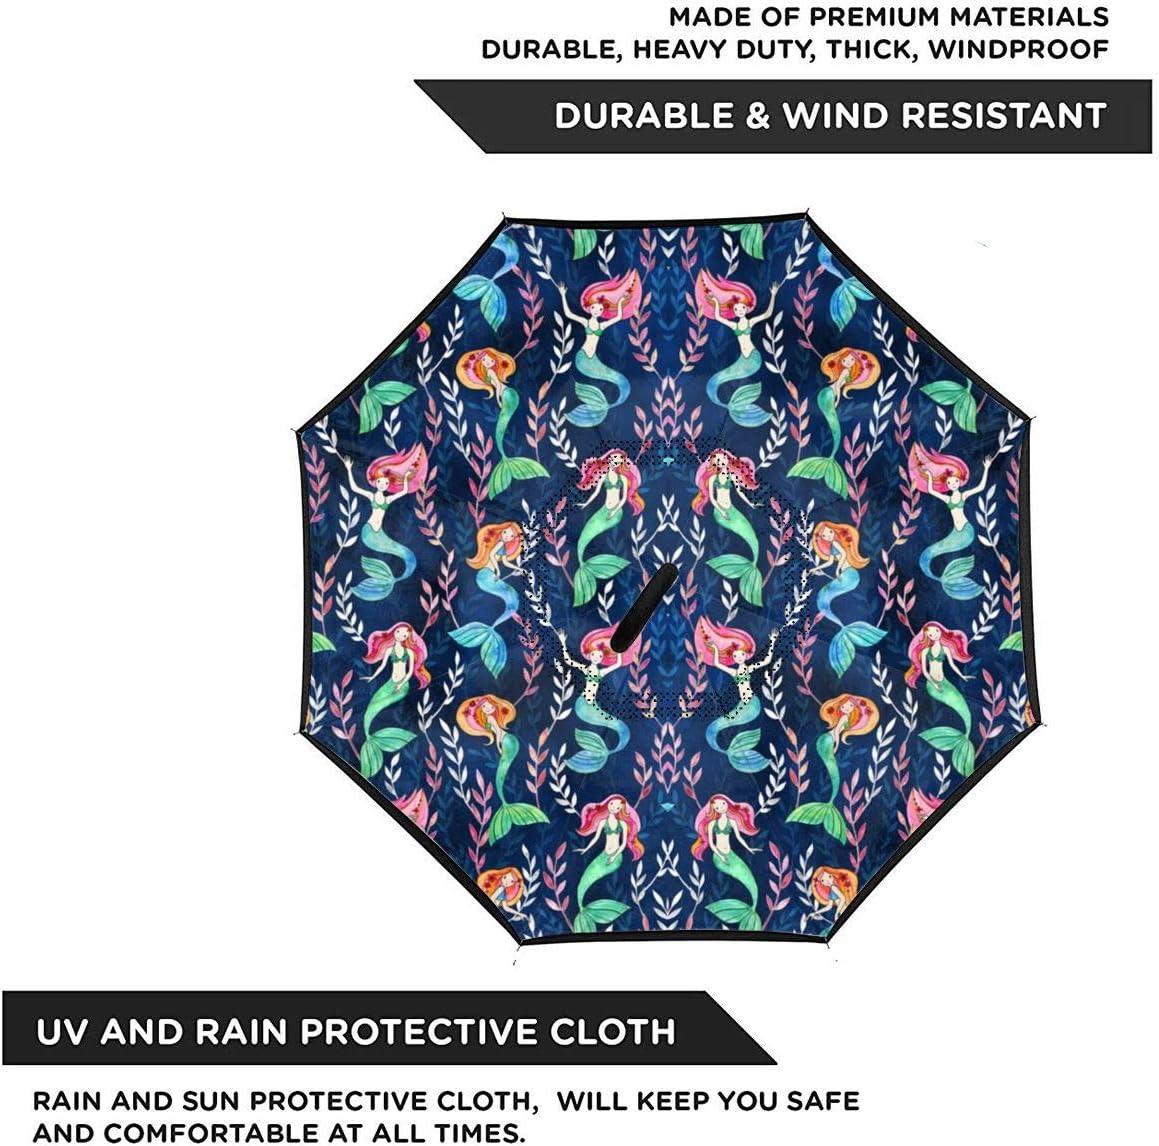 S200US Little Merry Mermaids Inverted Reverse Umbrella Sun/&Rain Car Large Windproof Travel UV Umbrella